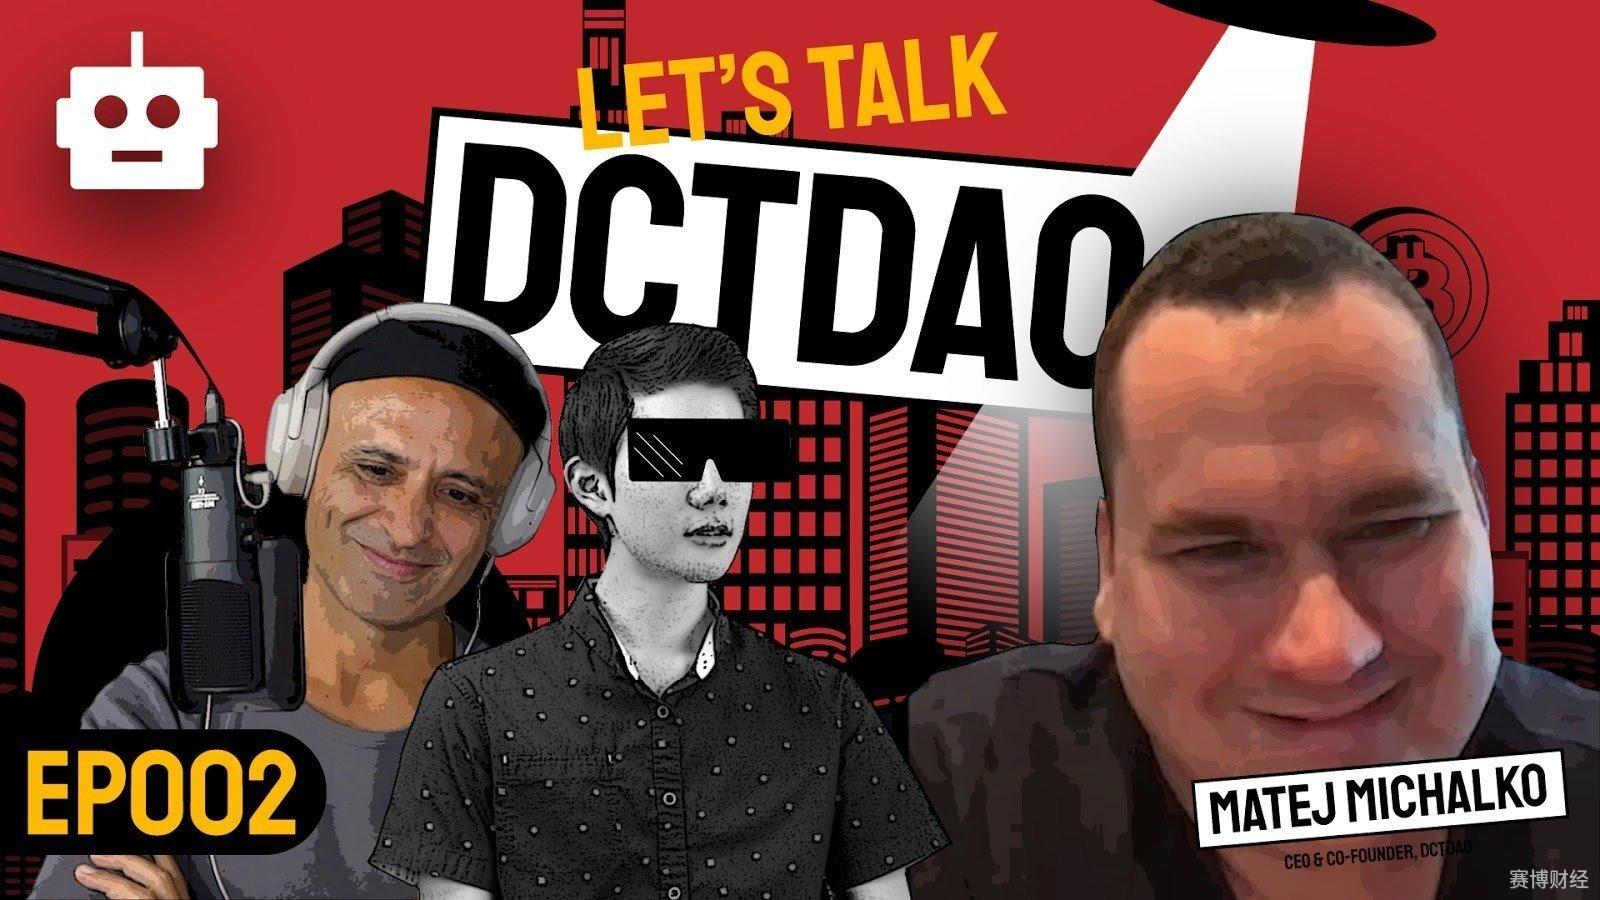 DCTDAO:跨链 DeFi 交易平台如何改变区块链的未来